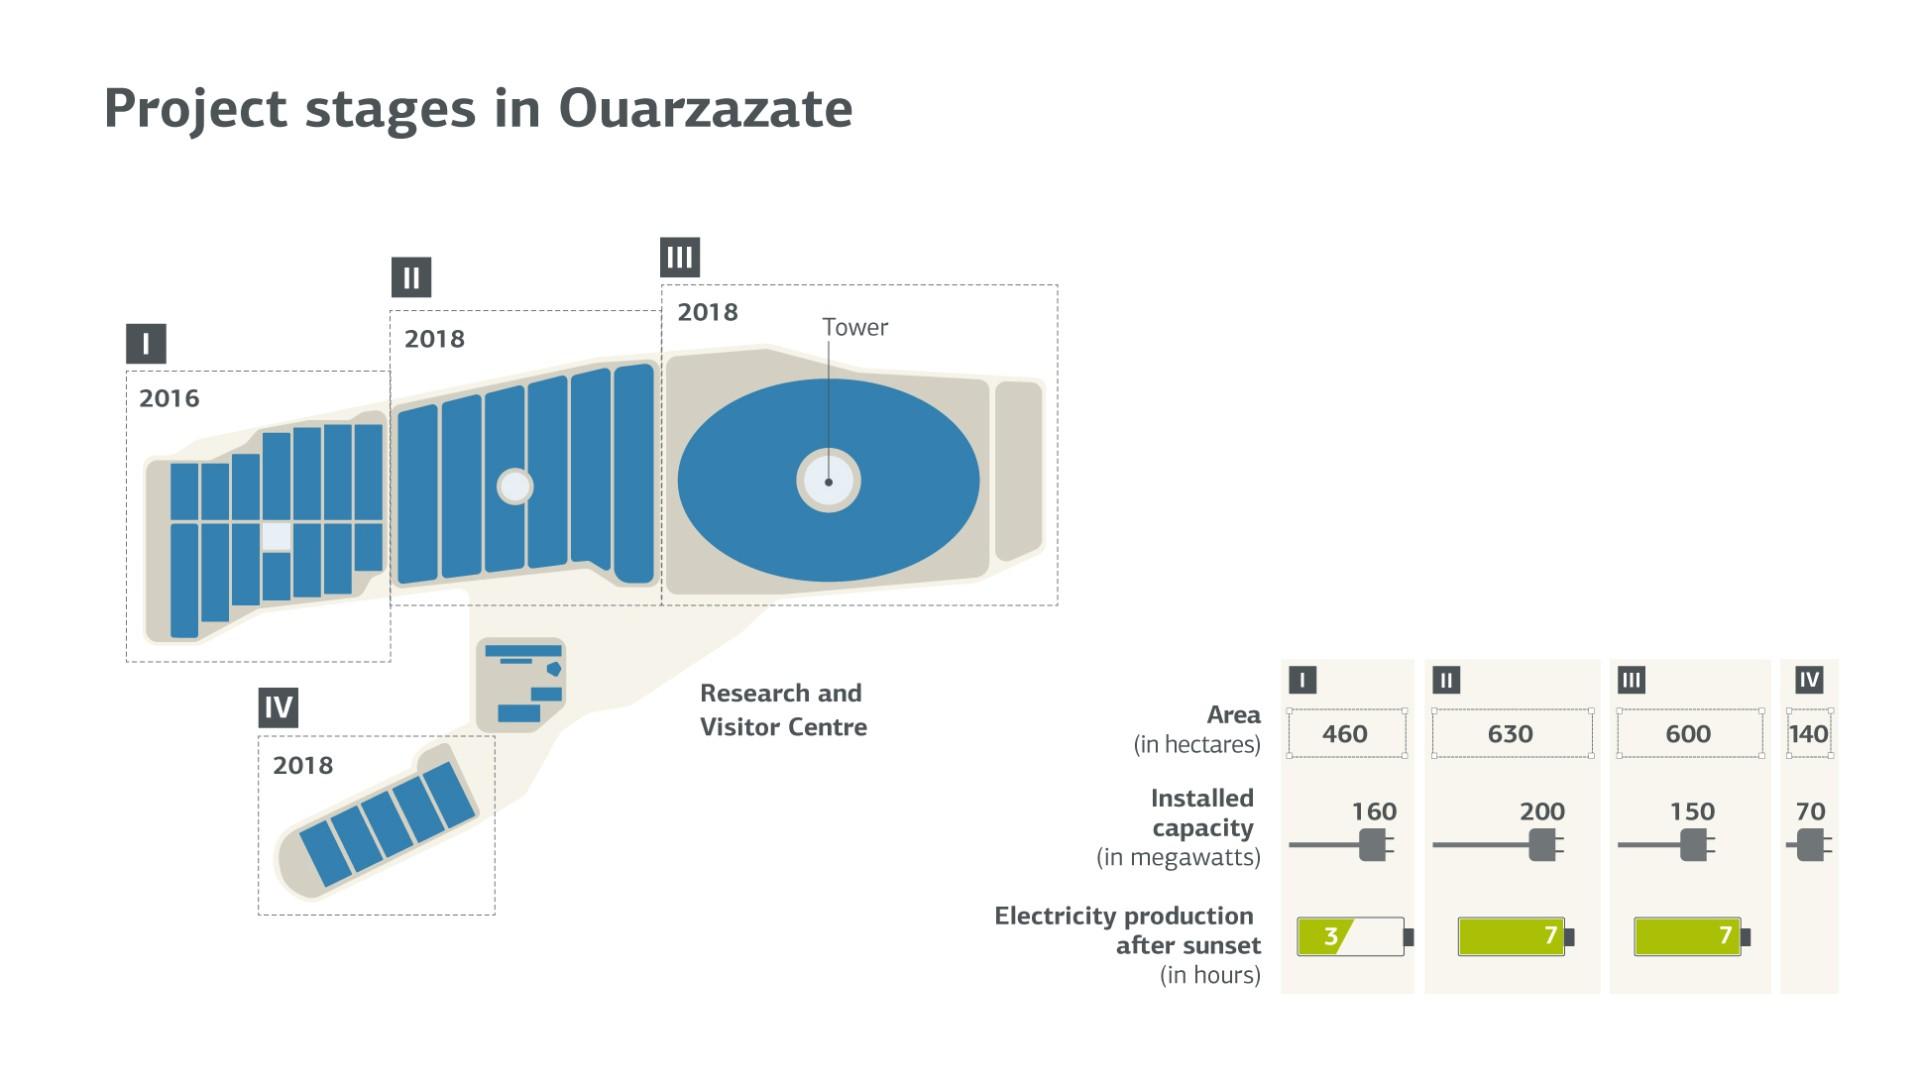 https://www.kfw.de/stories/kfw/bilder/umwelt/erneuerbare-energien/ouarzazate/ouarzazate-illustration-en_rs_picture_large.jpg